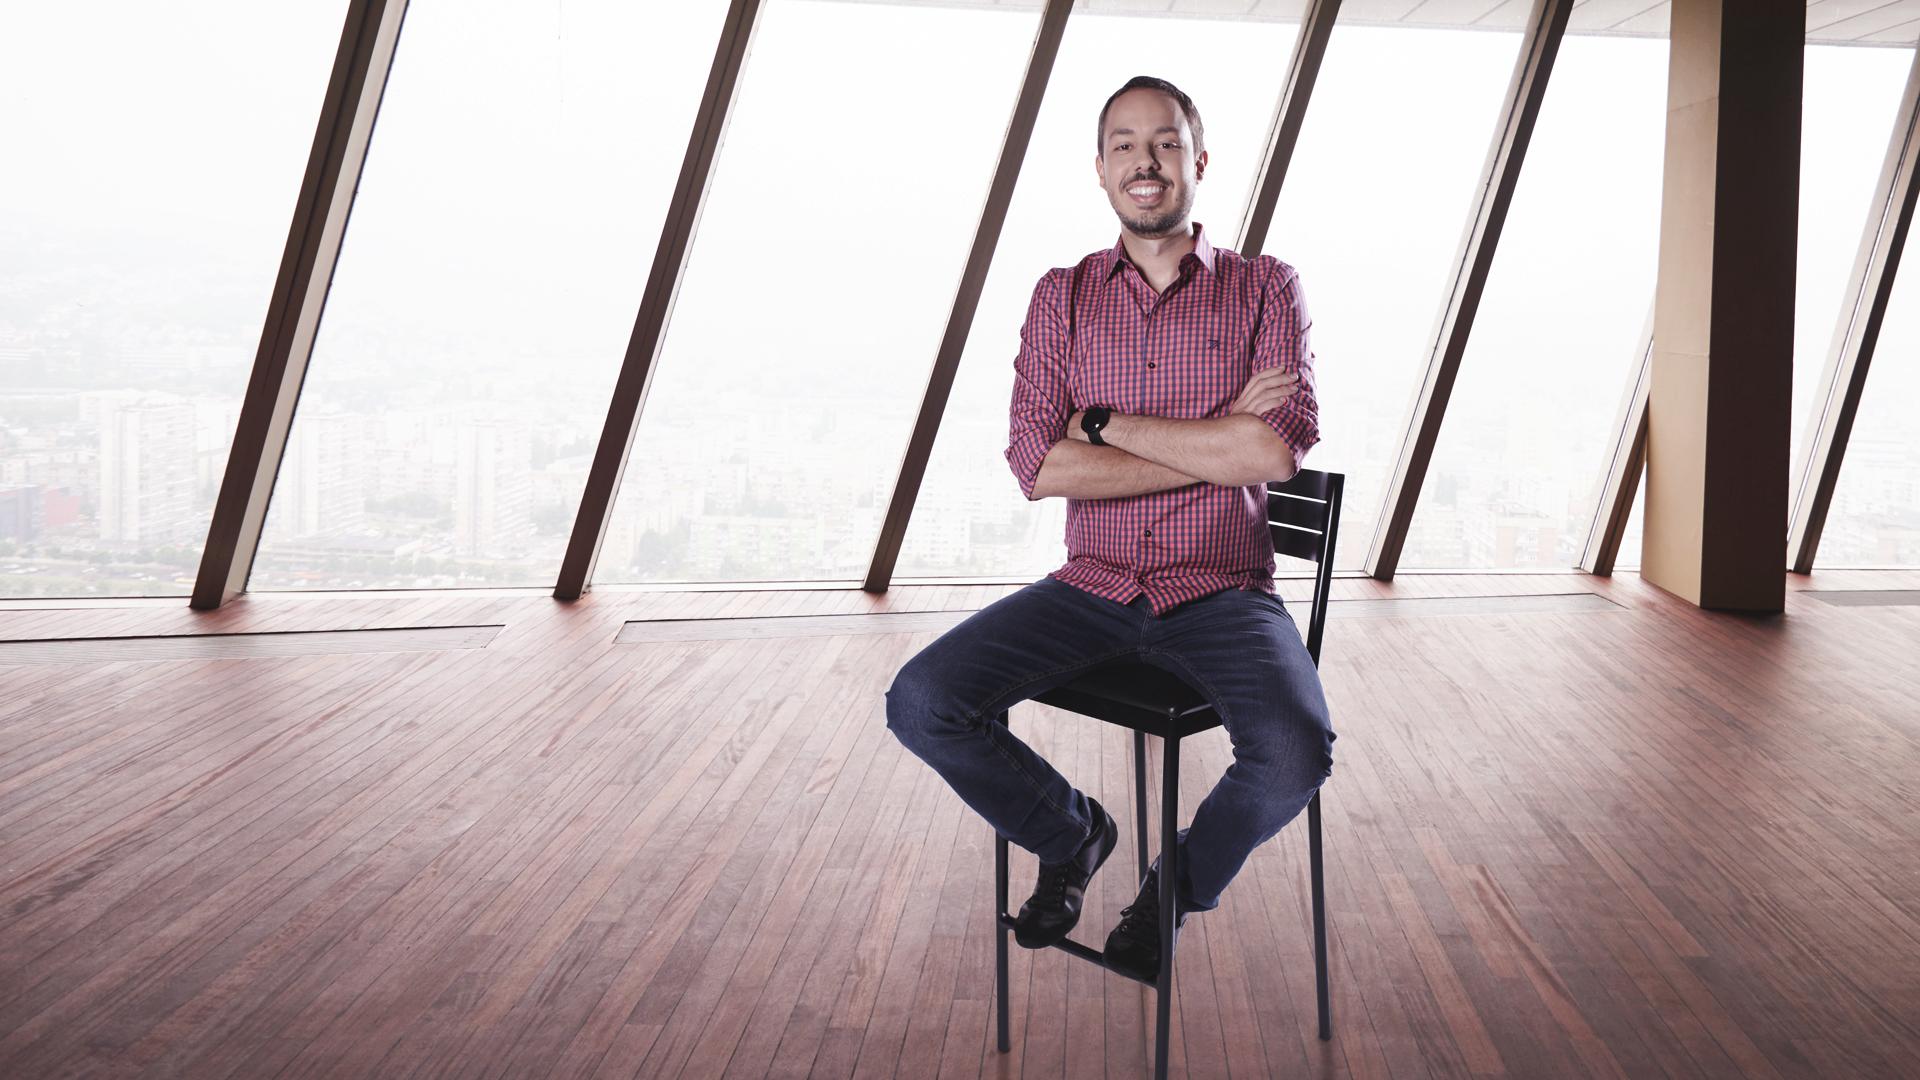 Gustavo Caetano, da Samba Tech, lança livro Pense Simples